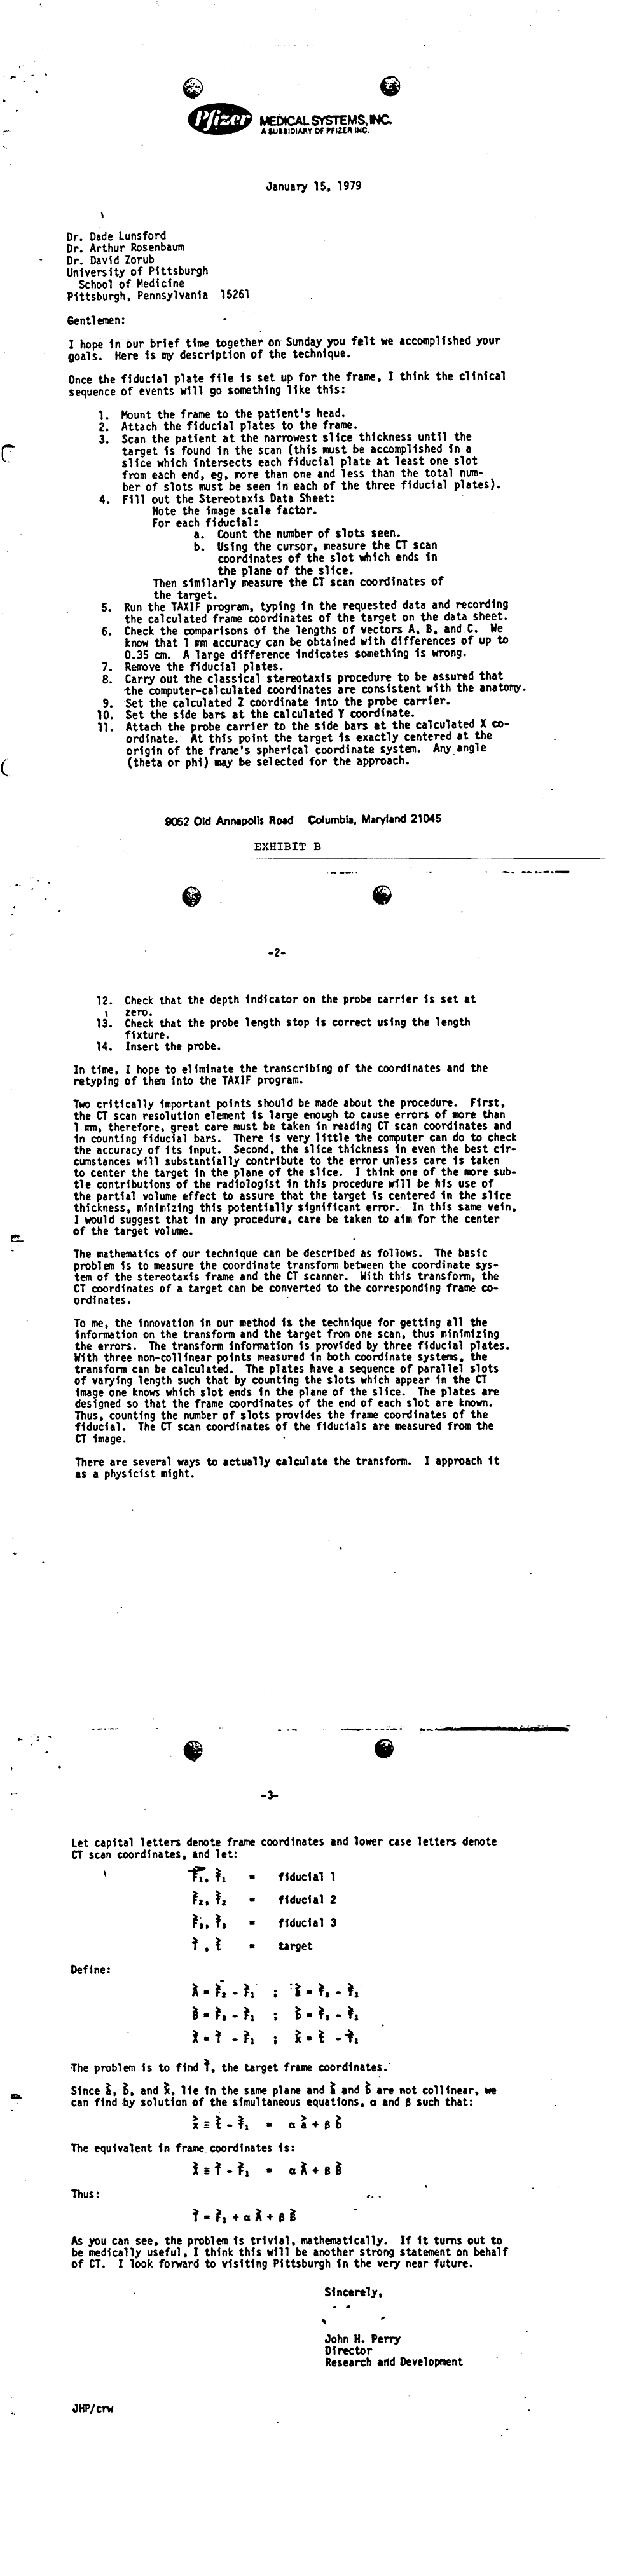 Appendix-1:-John-Perry-Letter,-pp.-1-3,-January-15,-1979